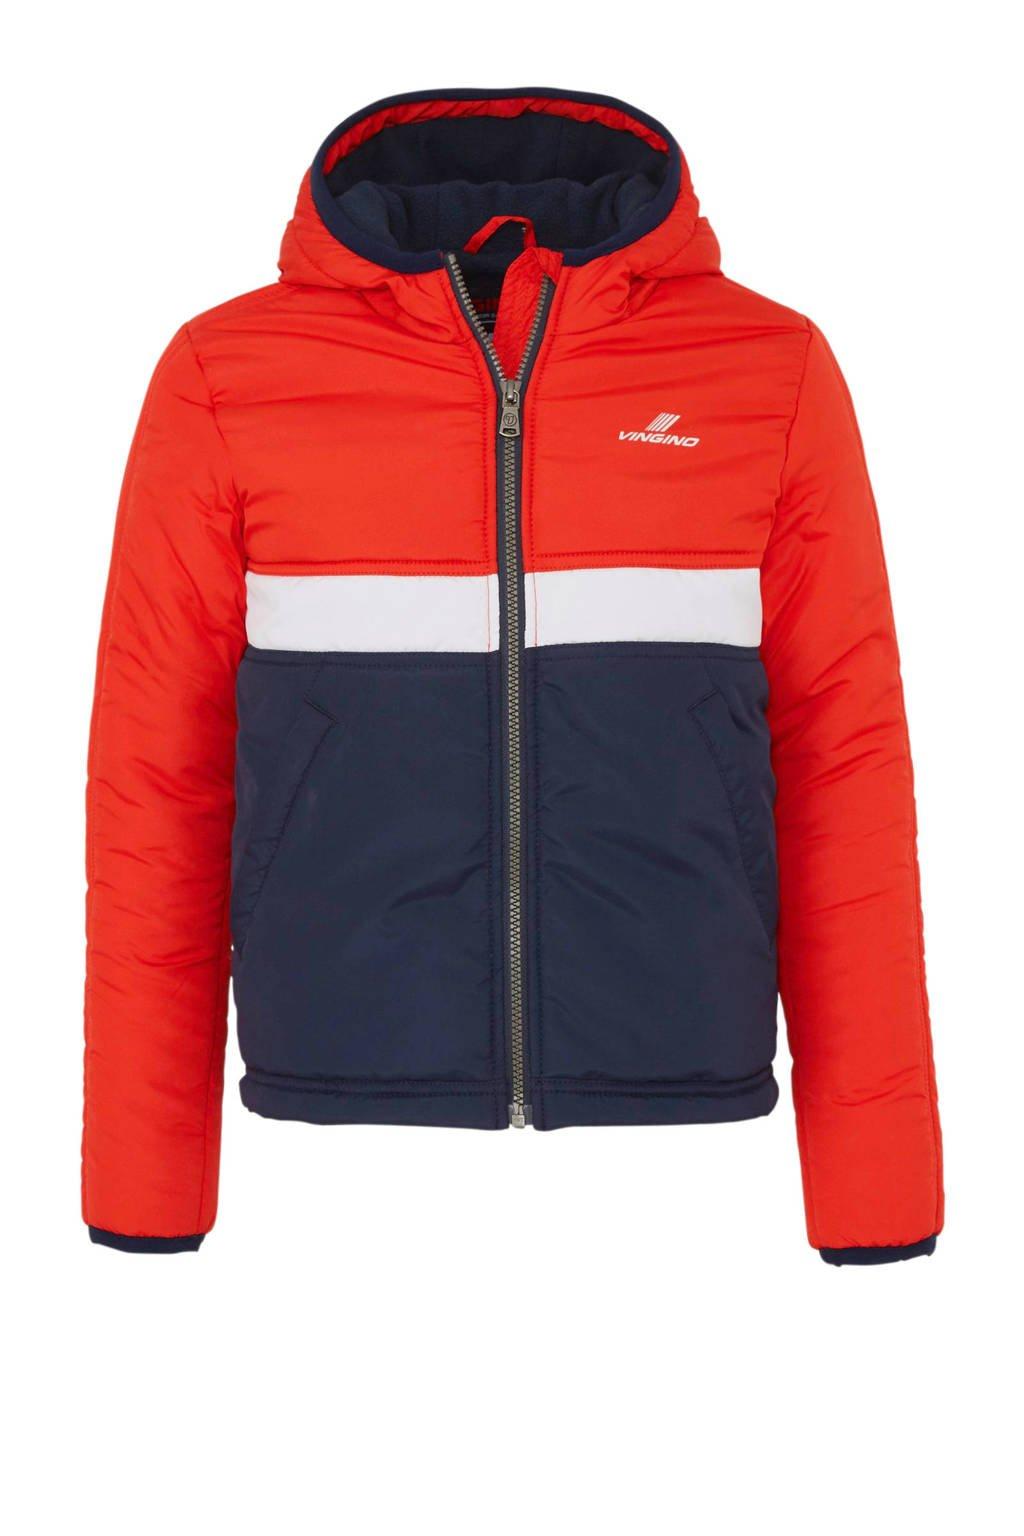 Vingino winterjas Tarlin rood/blauw/wit, Rood/donkerblauw/wit